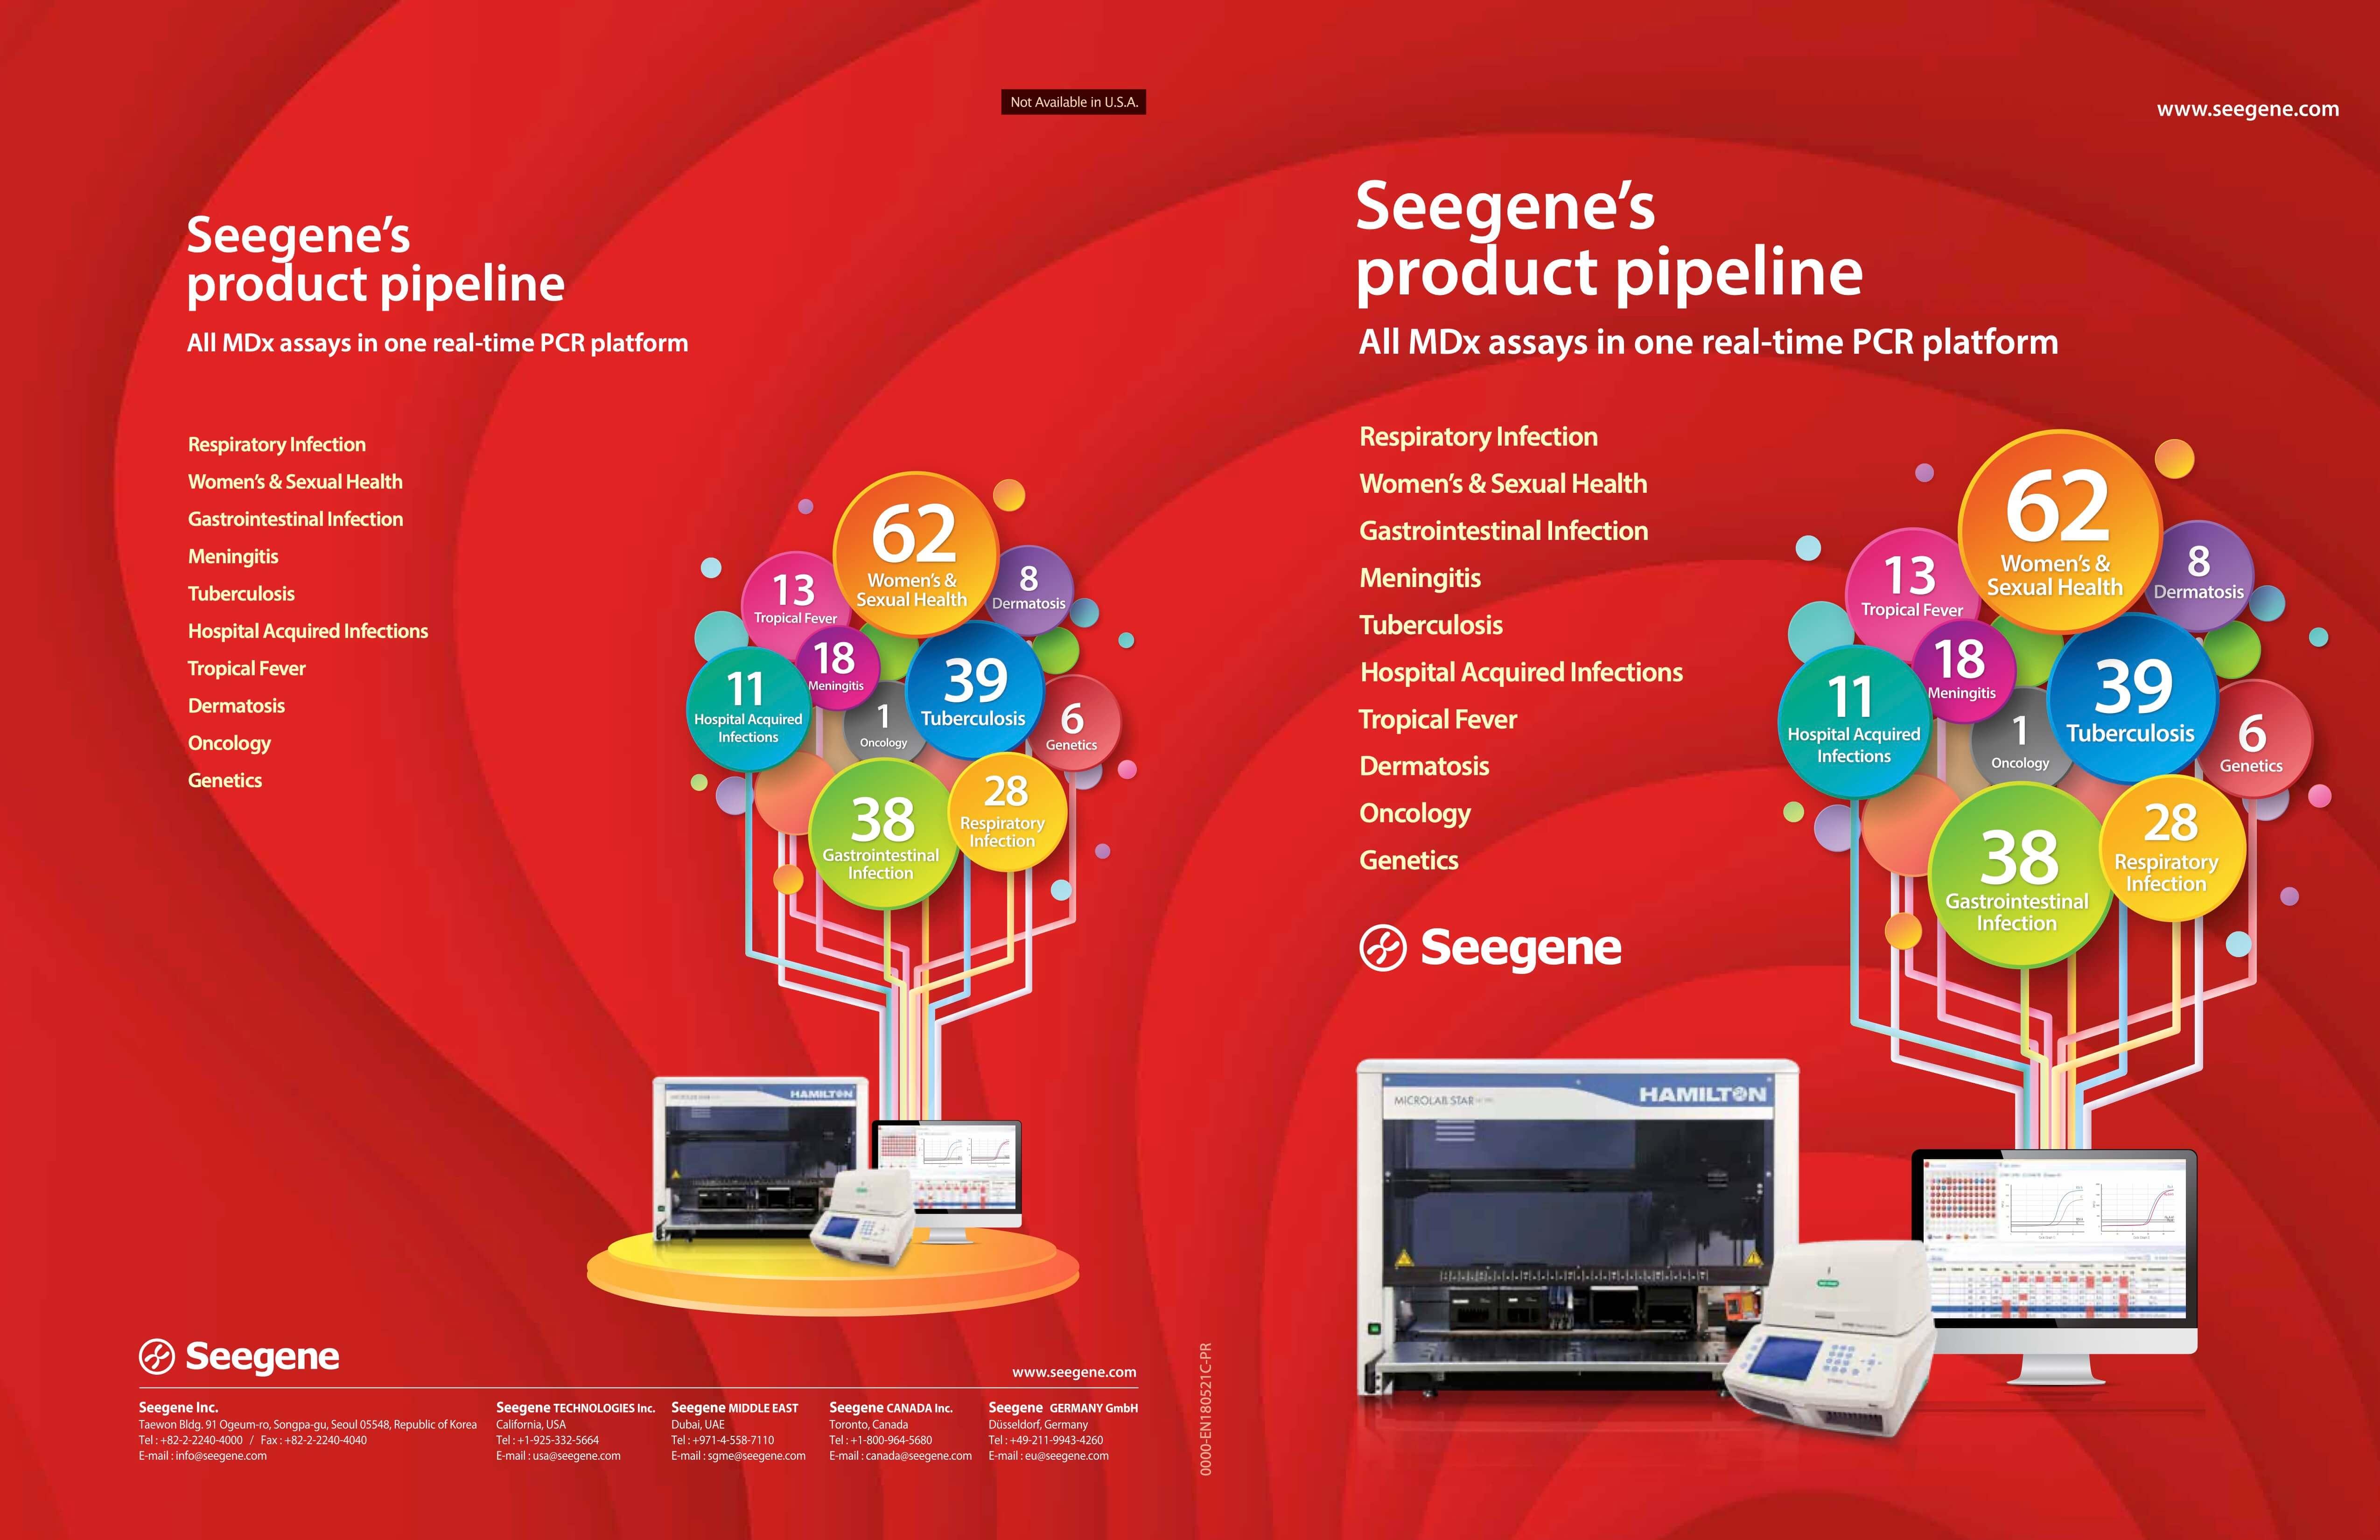 Seegene's product pipeline